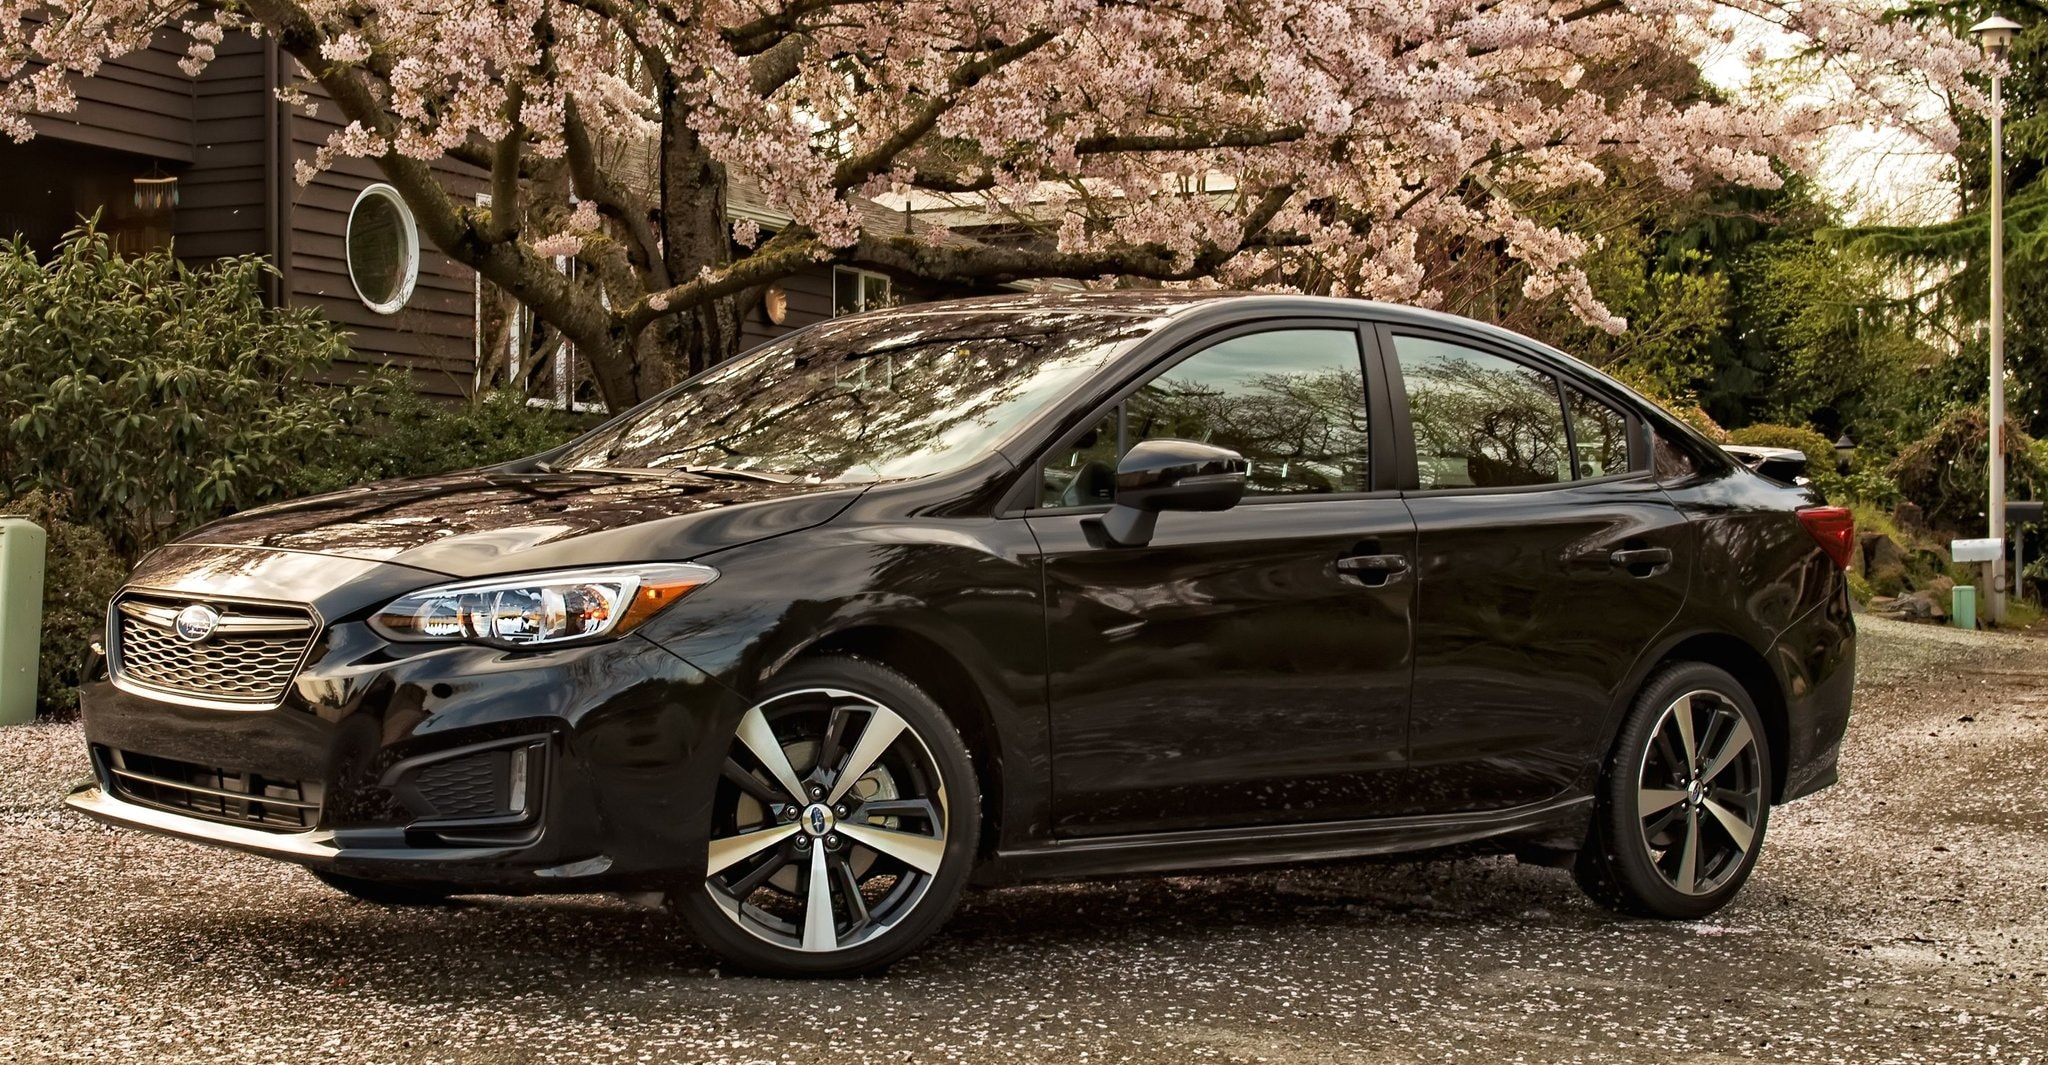 2017 Subaru Impreza Chosen For Wards 10 Best User Experience List